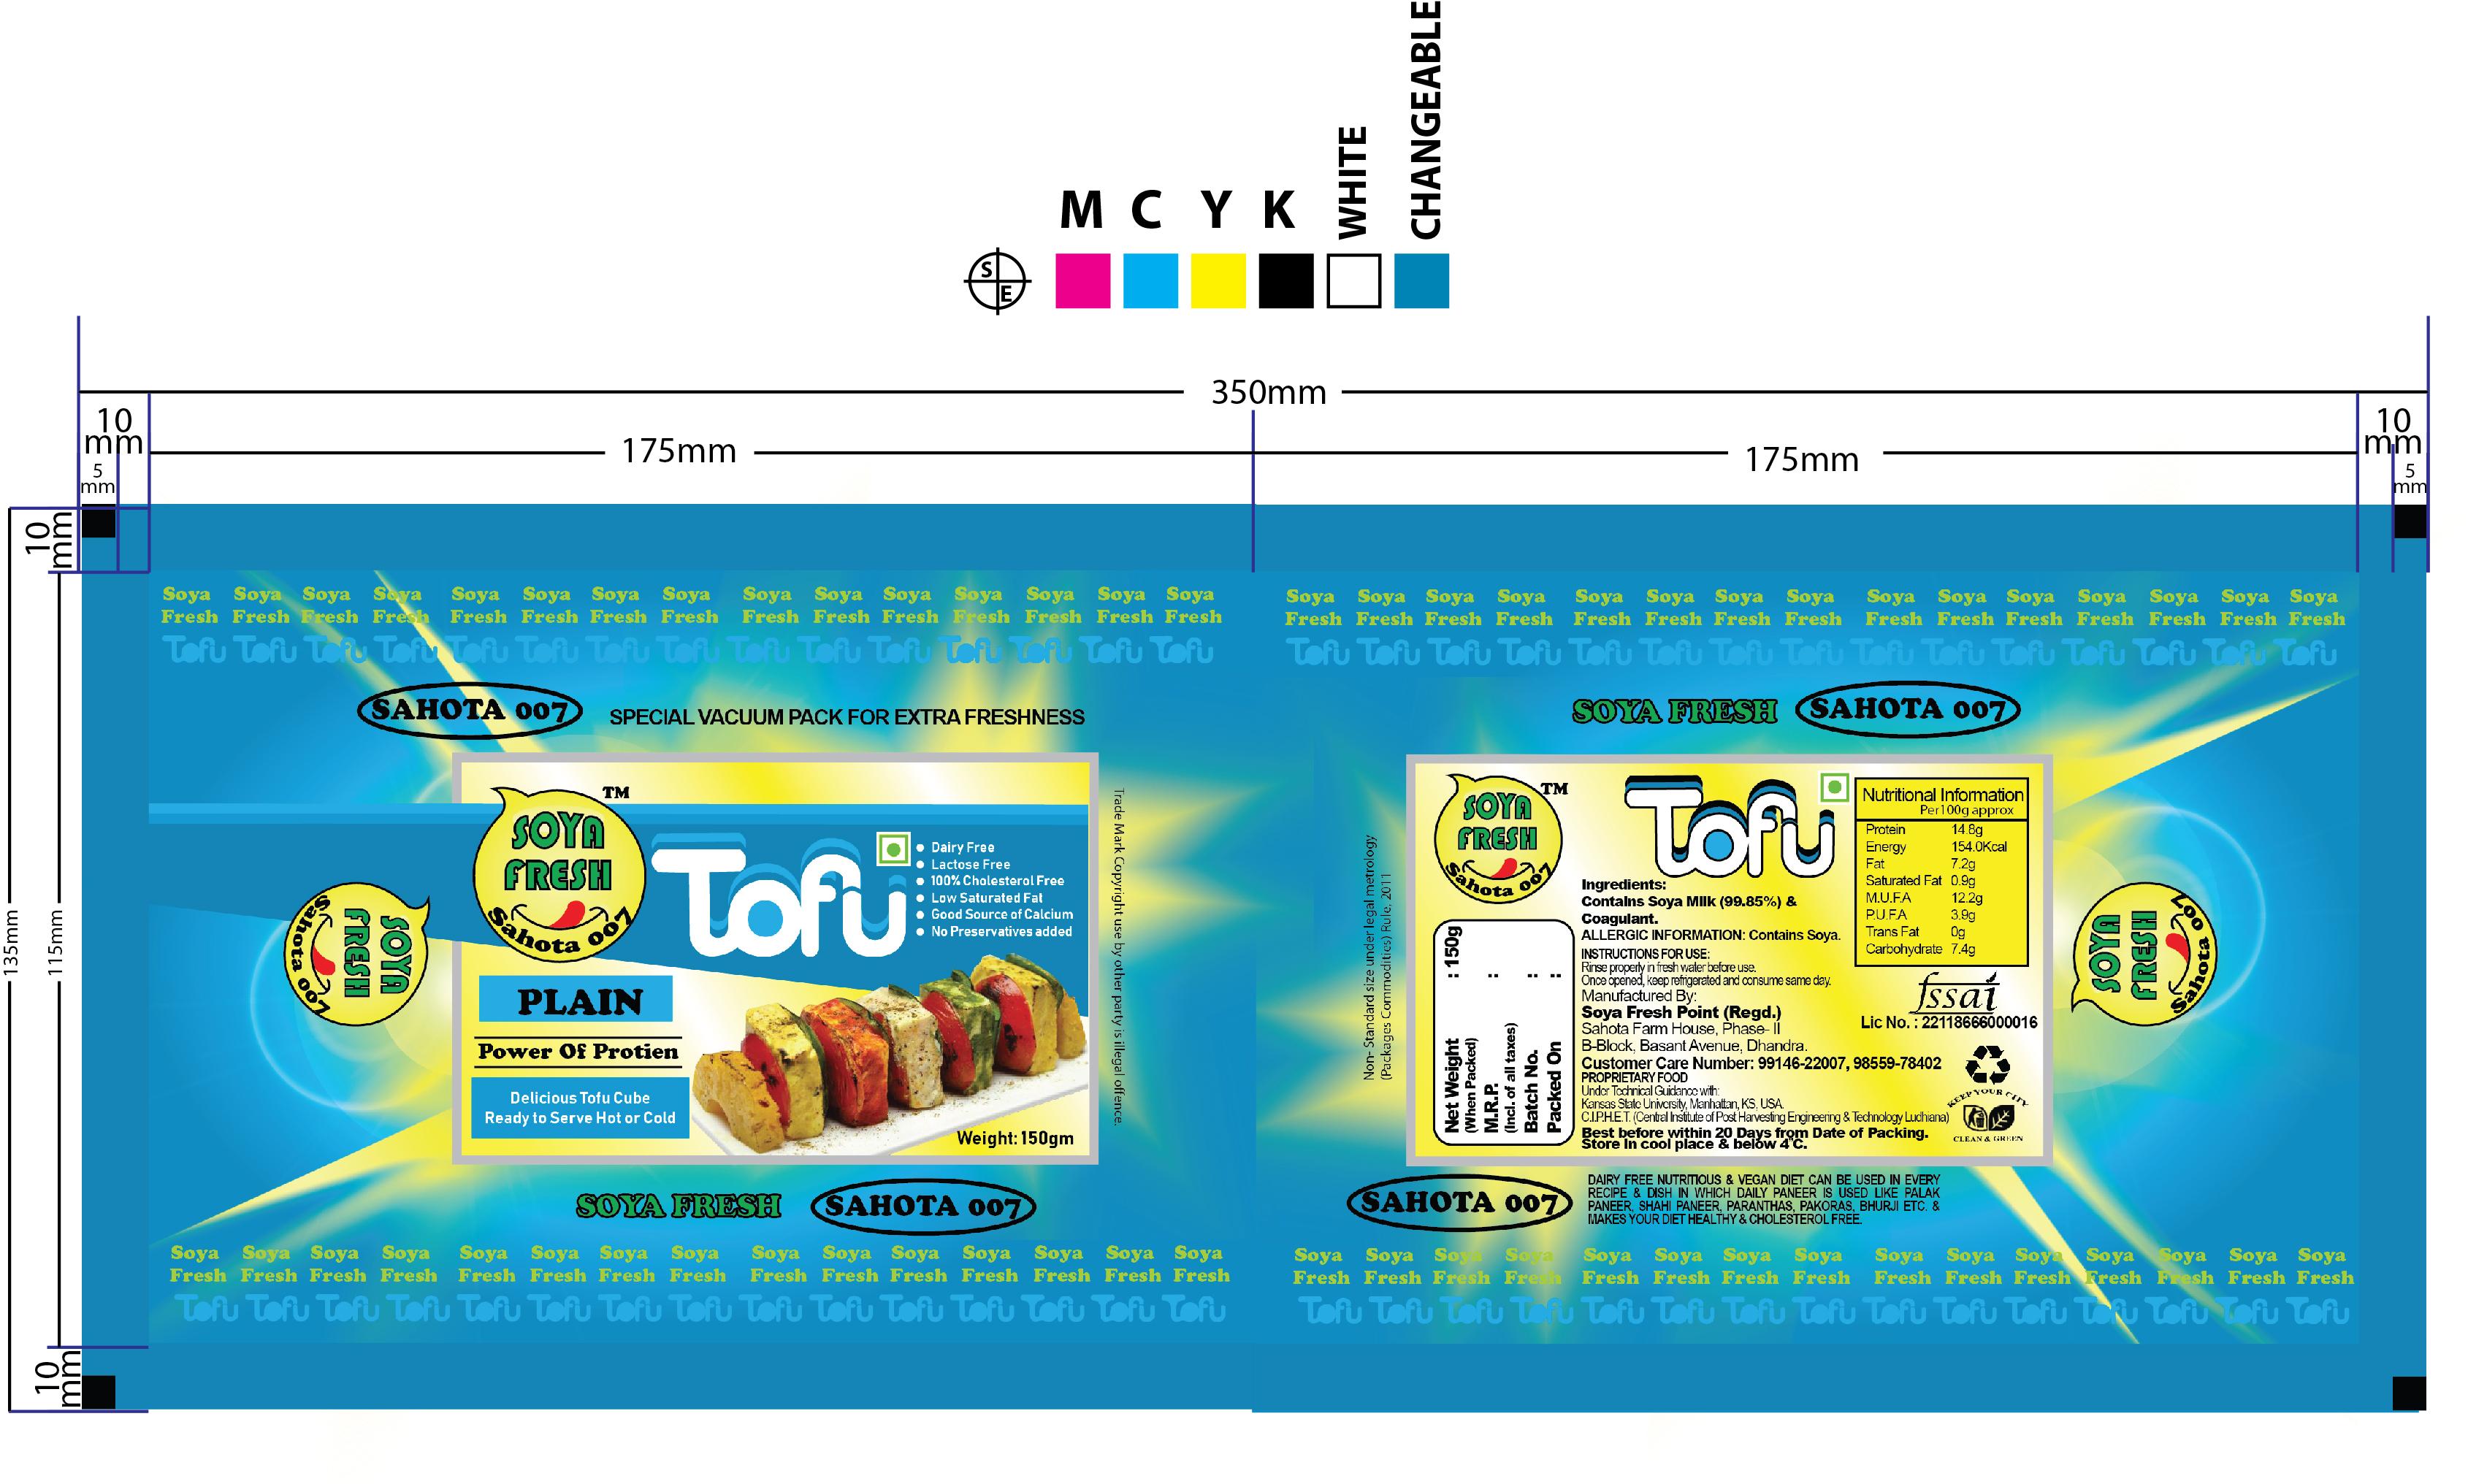 Vegan Soya Tofu